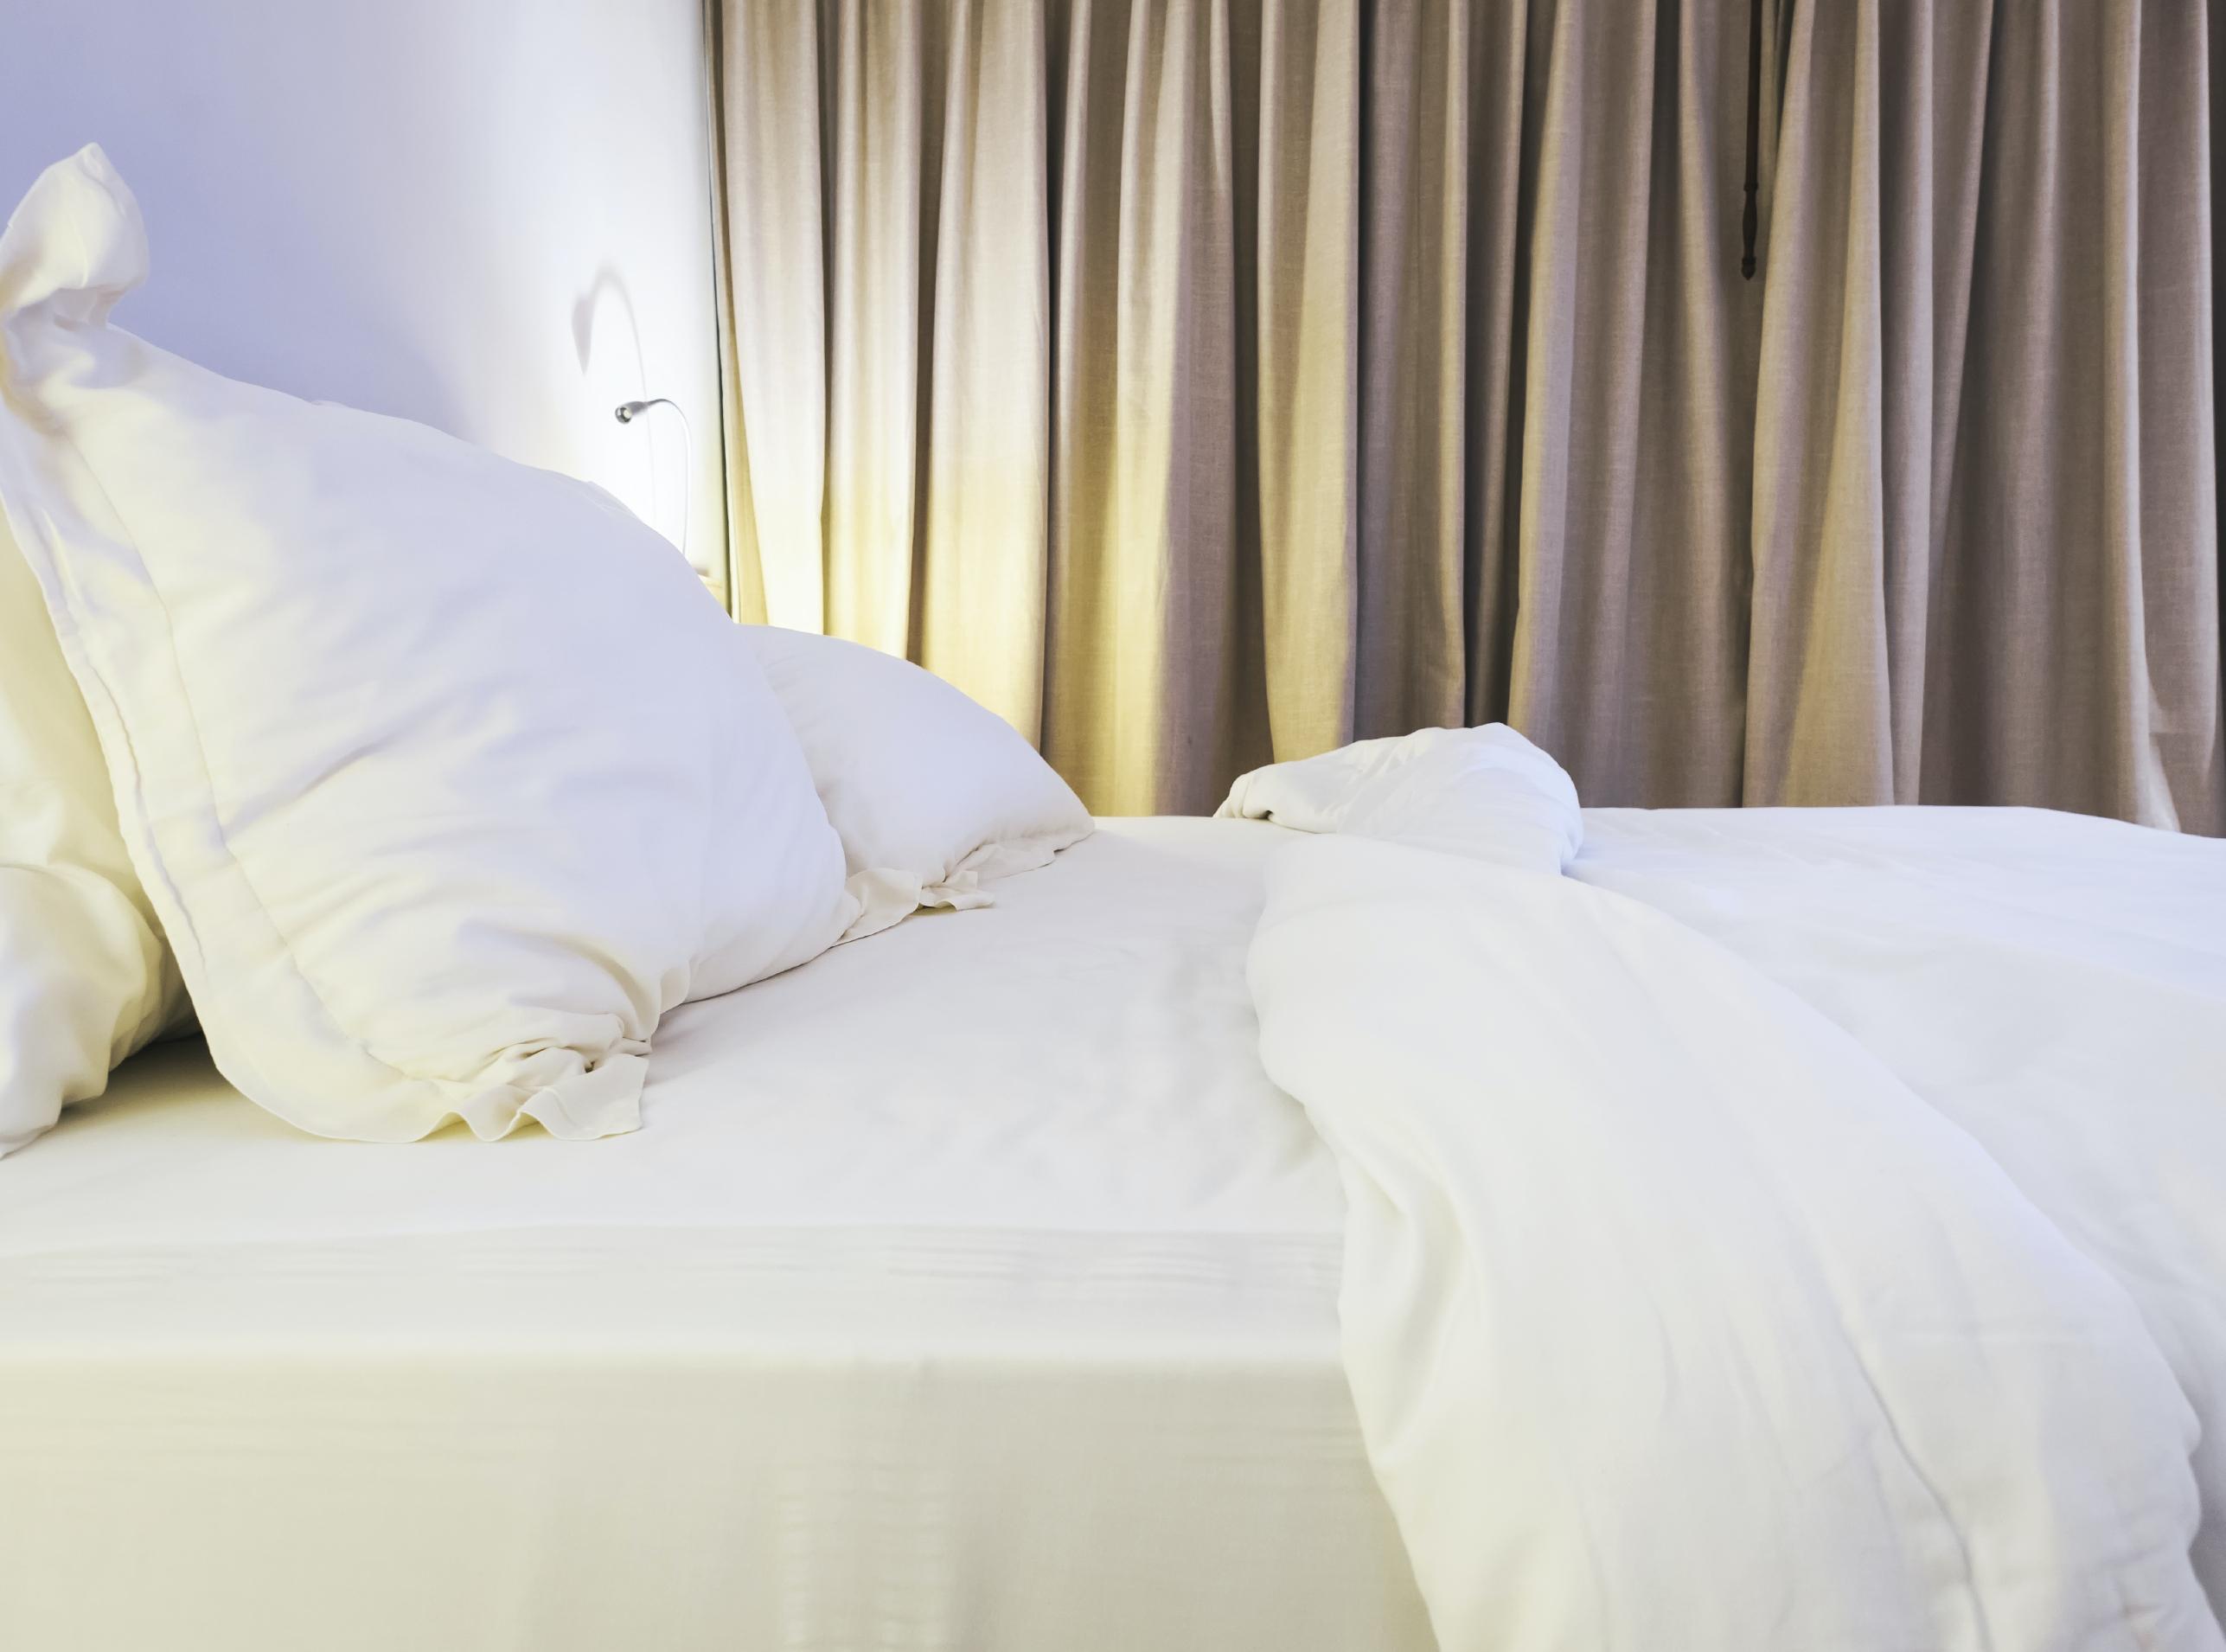 Topmoderne Rens madrassen | Sådan får du en helt ren madras | bobedre.dk HO-77